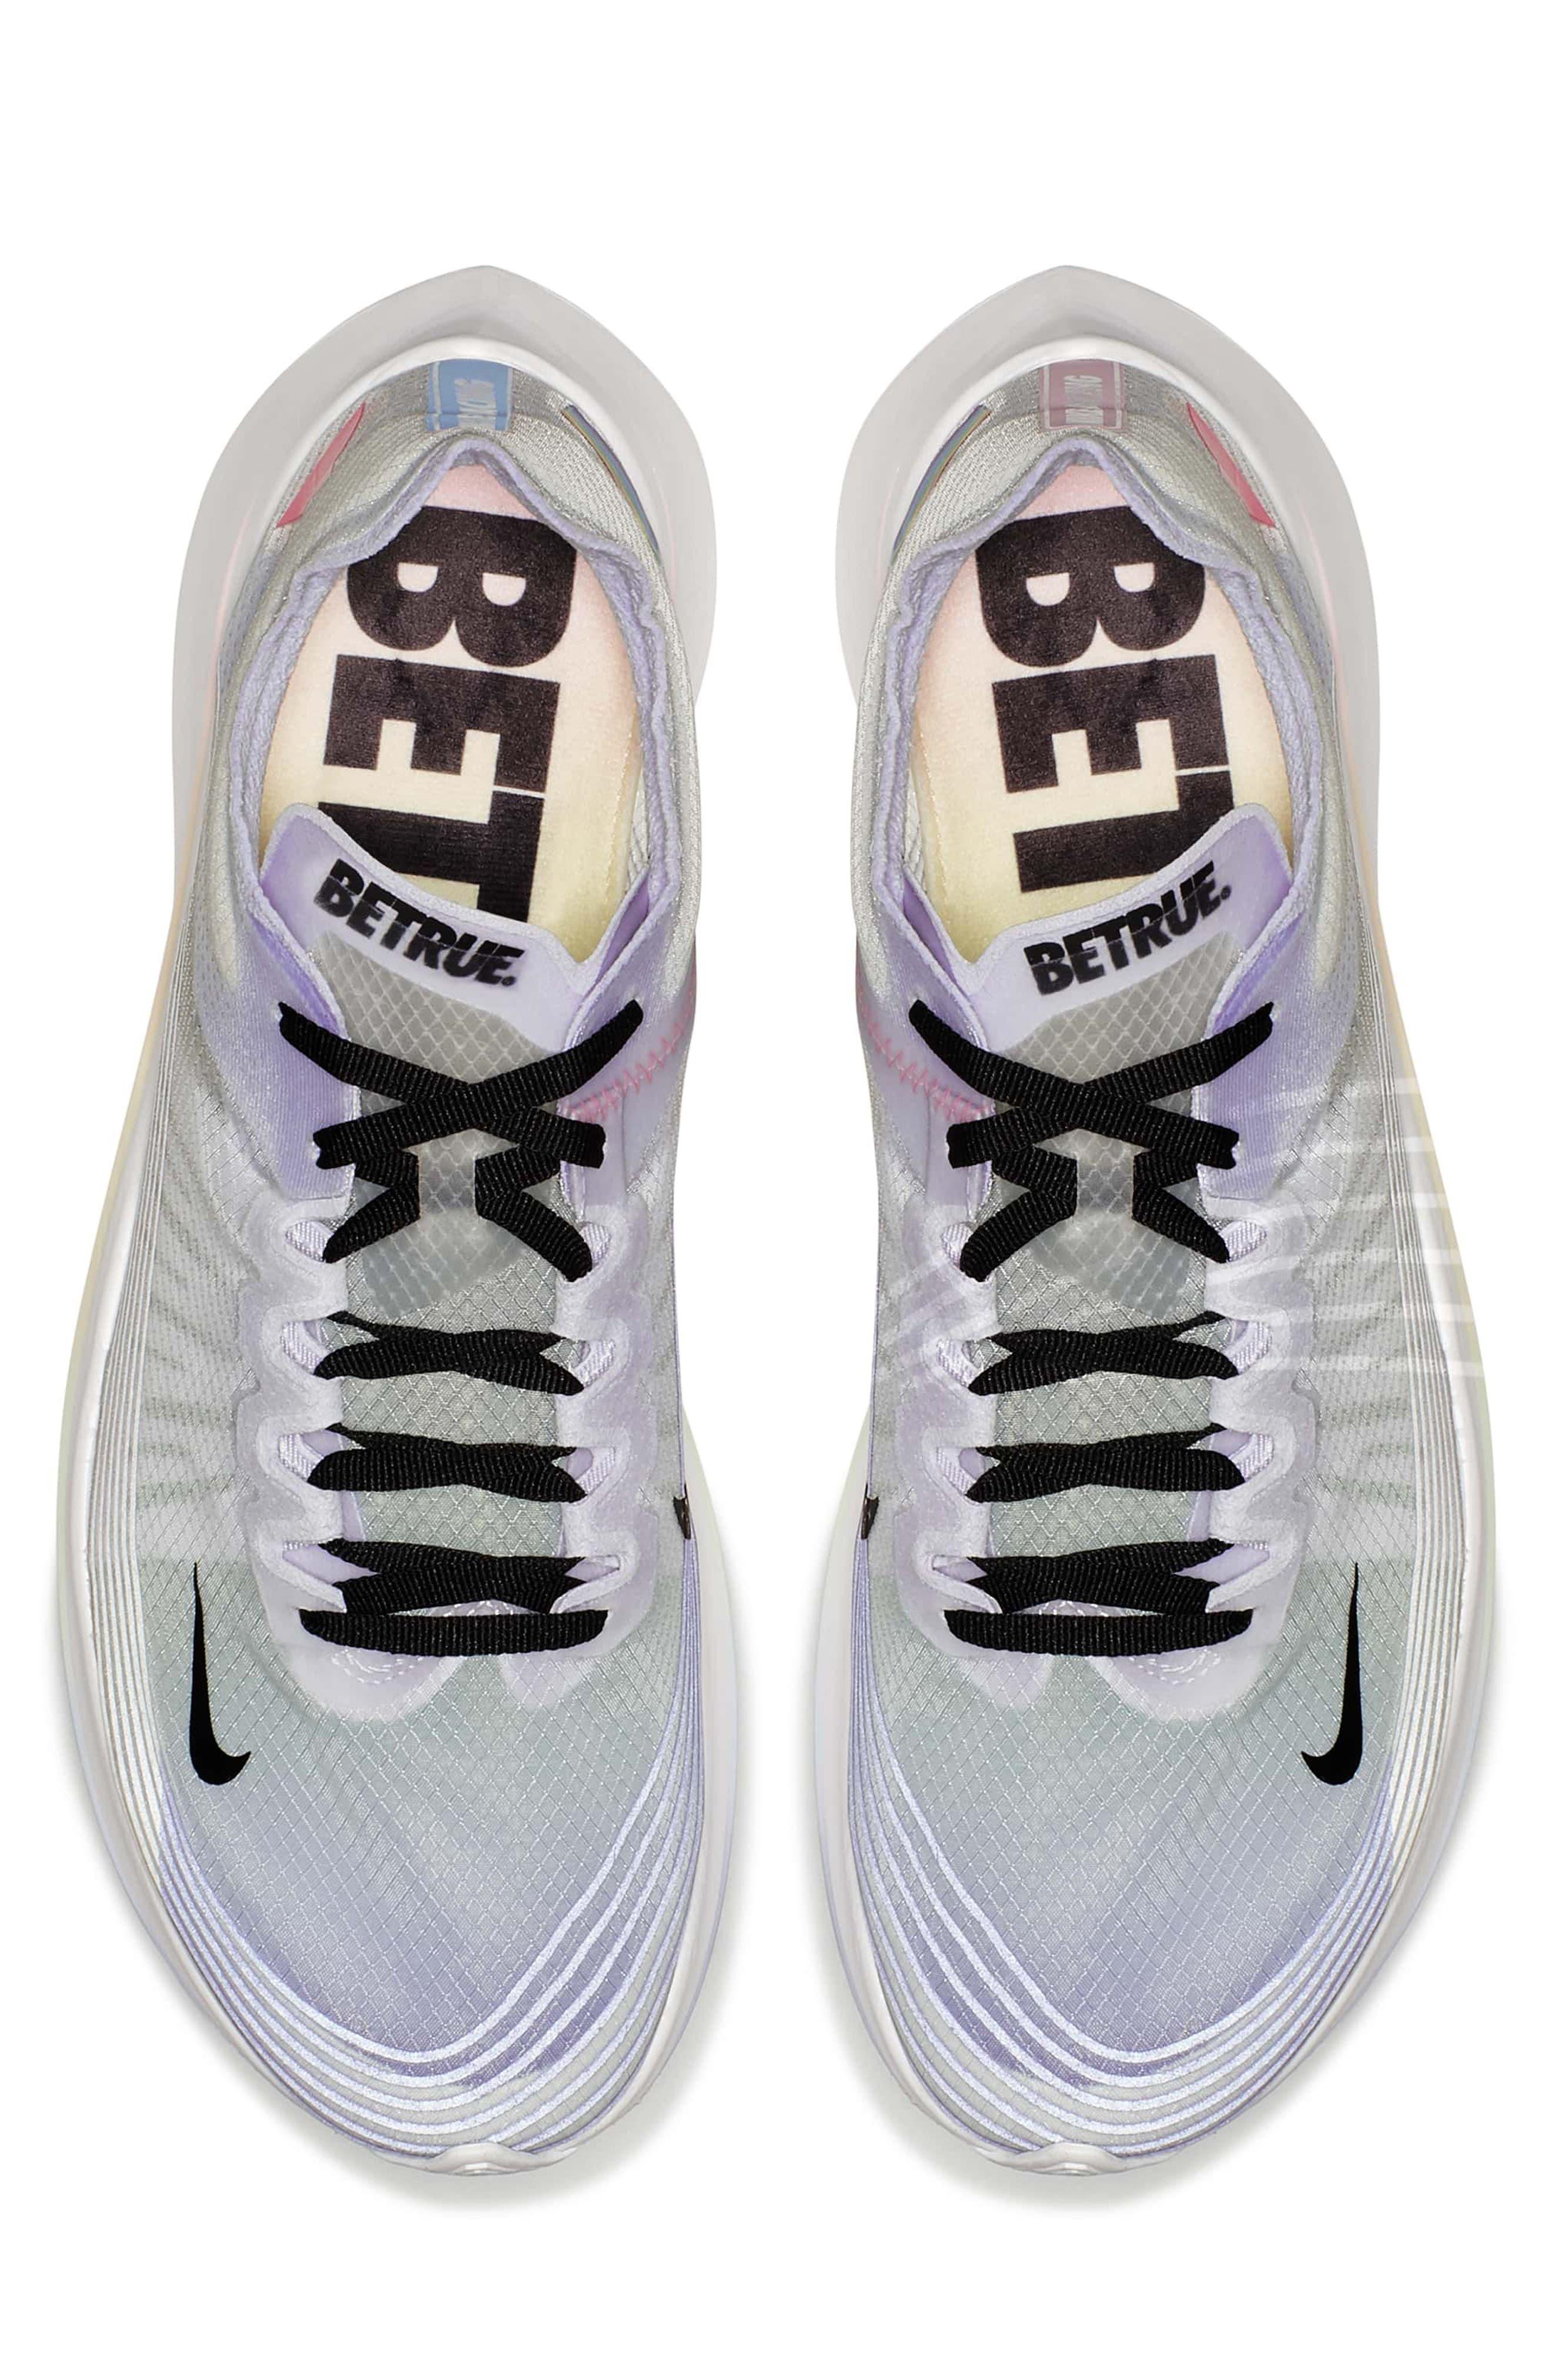 Nordstrom x Nike Zoom Fly BETRUE Running Shoe,                             Alternate thumbnail 5, color,                             White/ Black/ Palest Purple